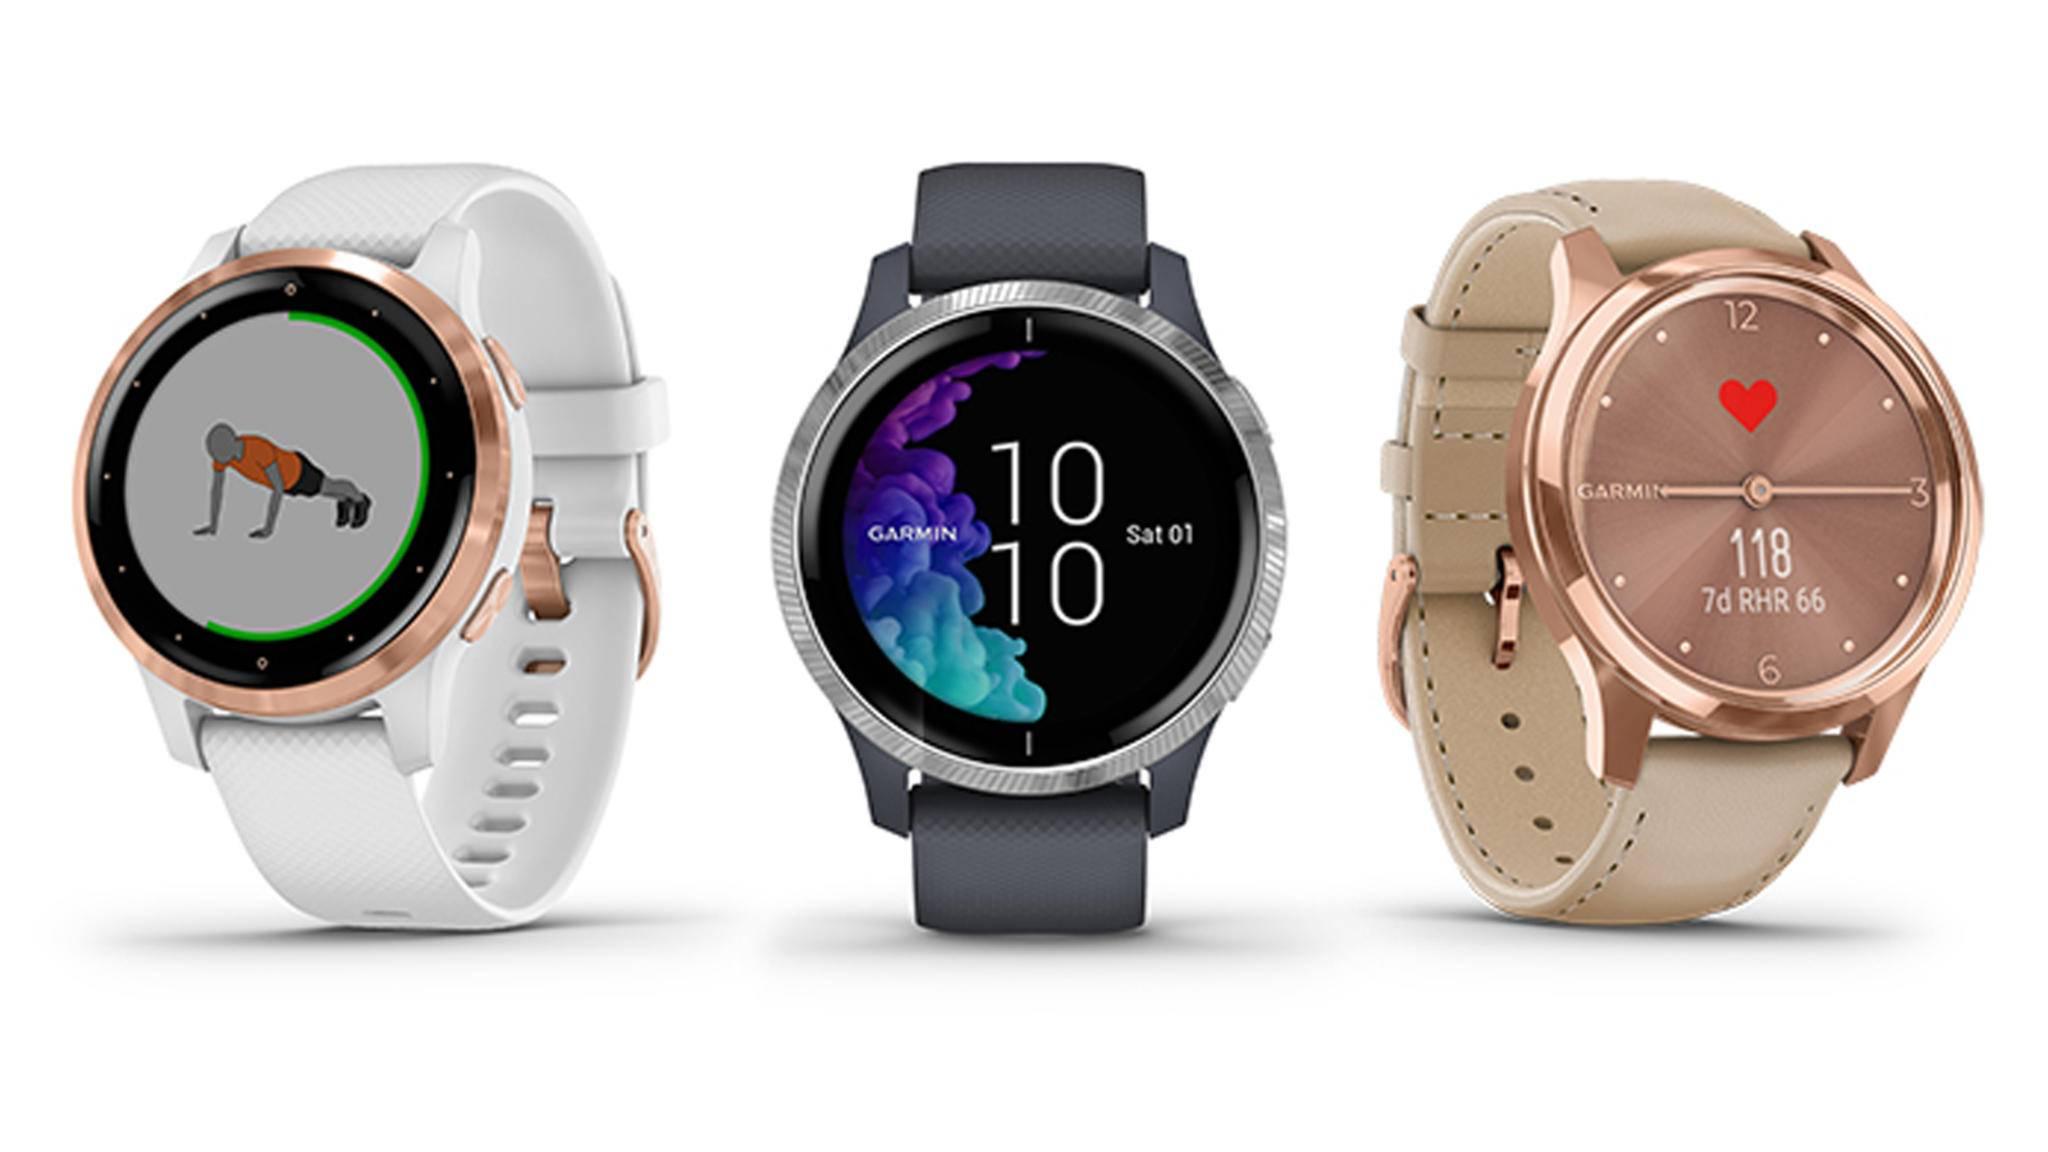 Garmin-Smartwatch-Garmin Vivoactive 4-Garmin Venu-Garmin Vivomove-Garmin Deutschland GmbH